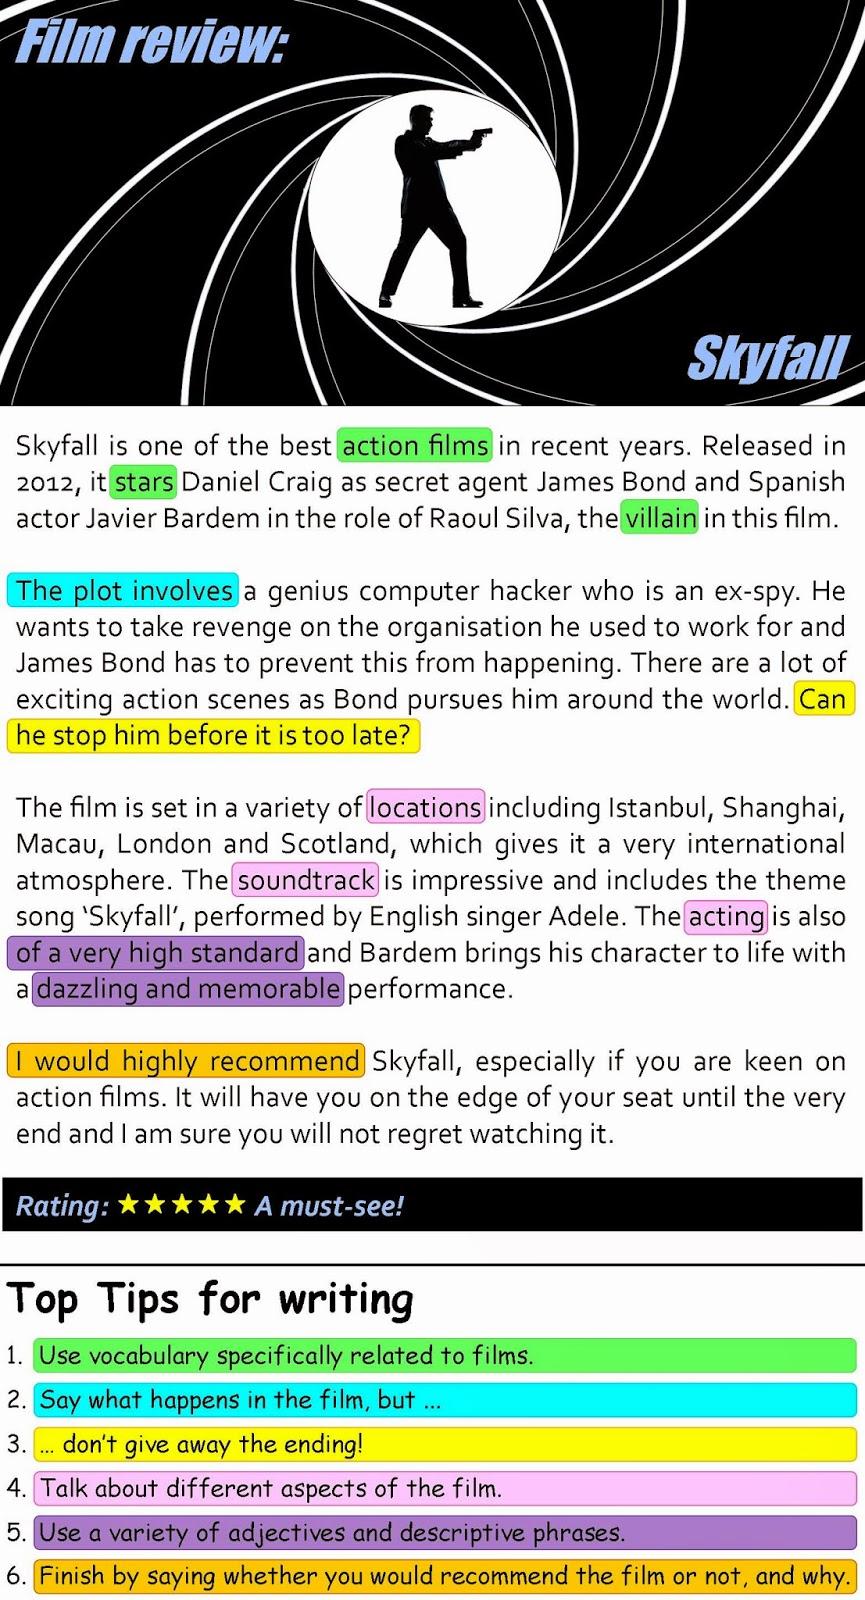 Click film review